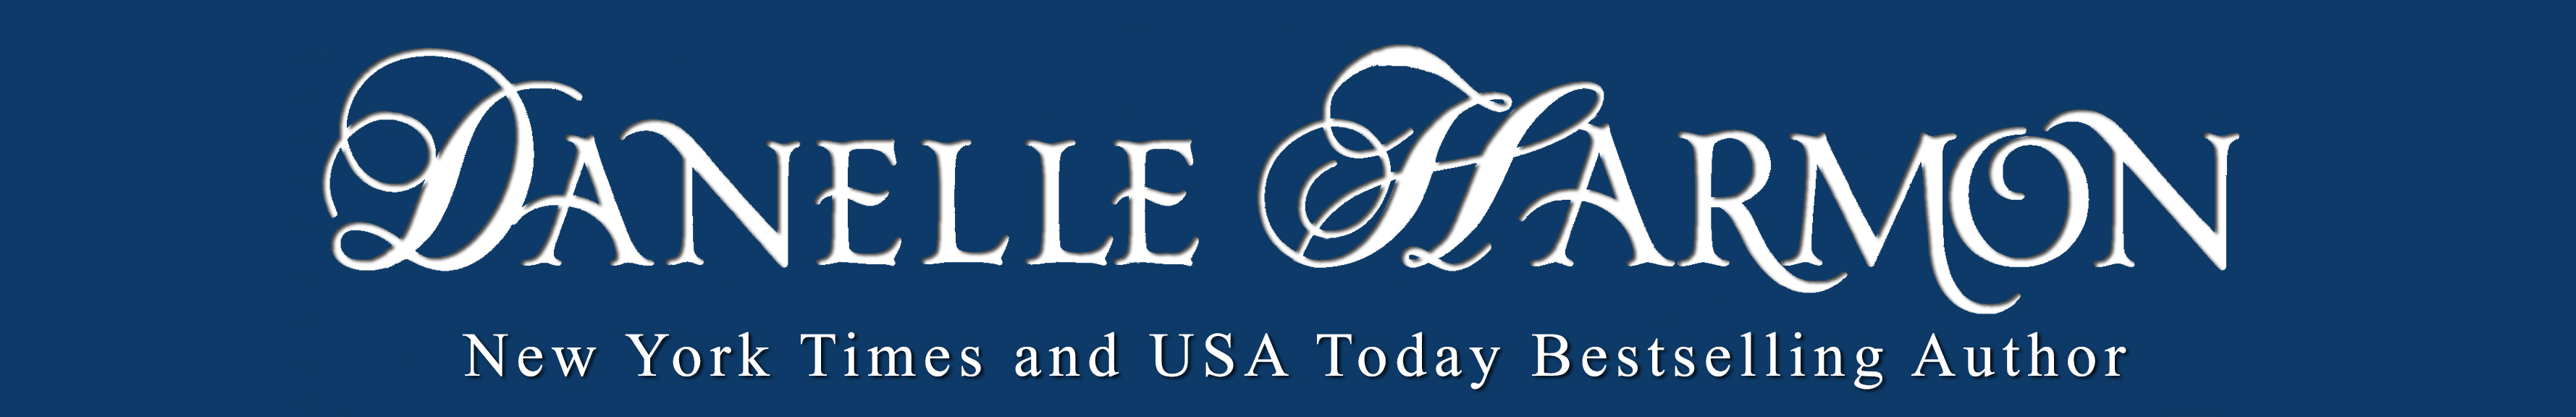 Danelle Harmon – NYT Bestselling Author -